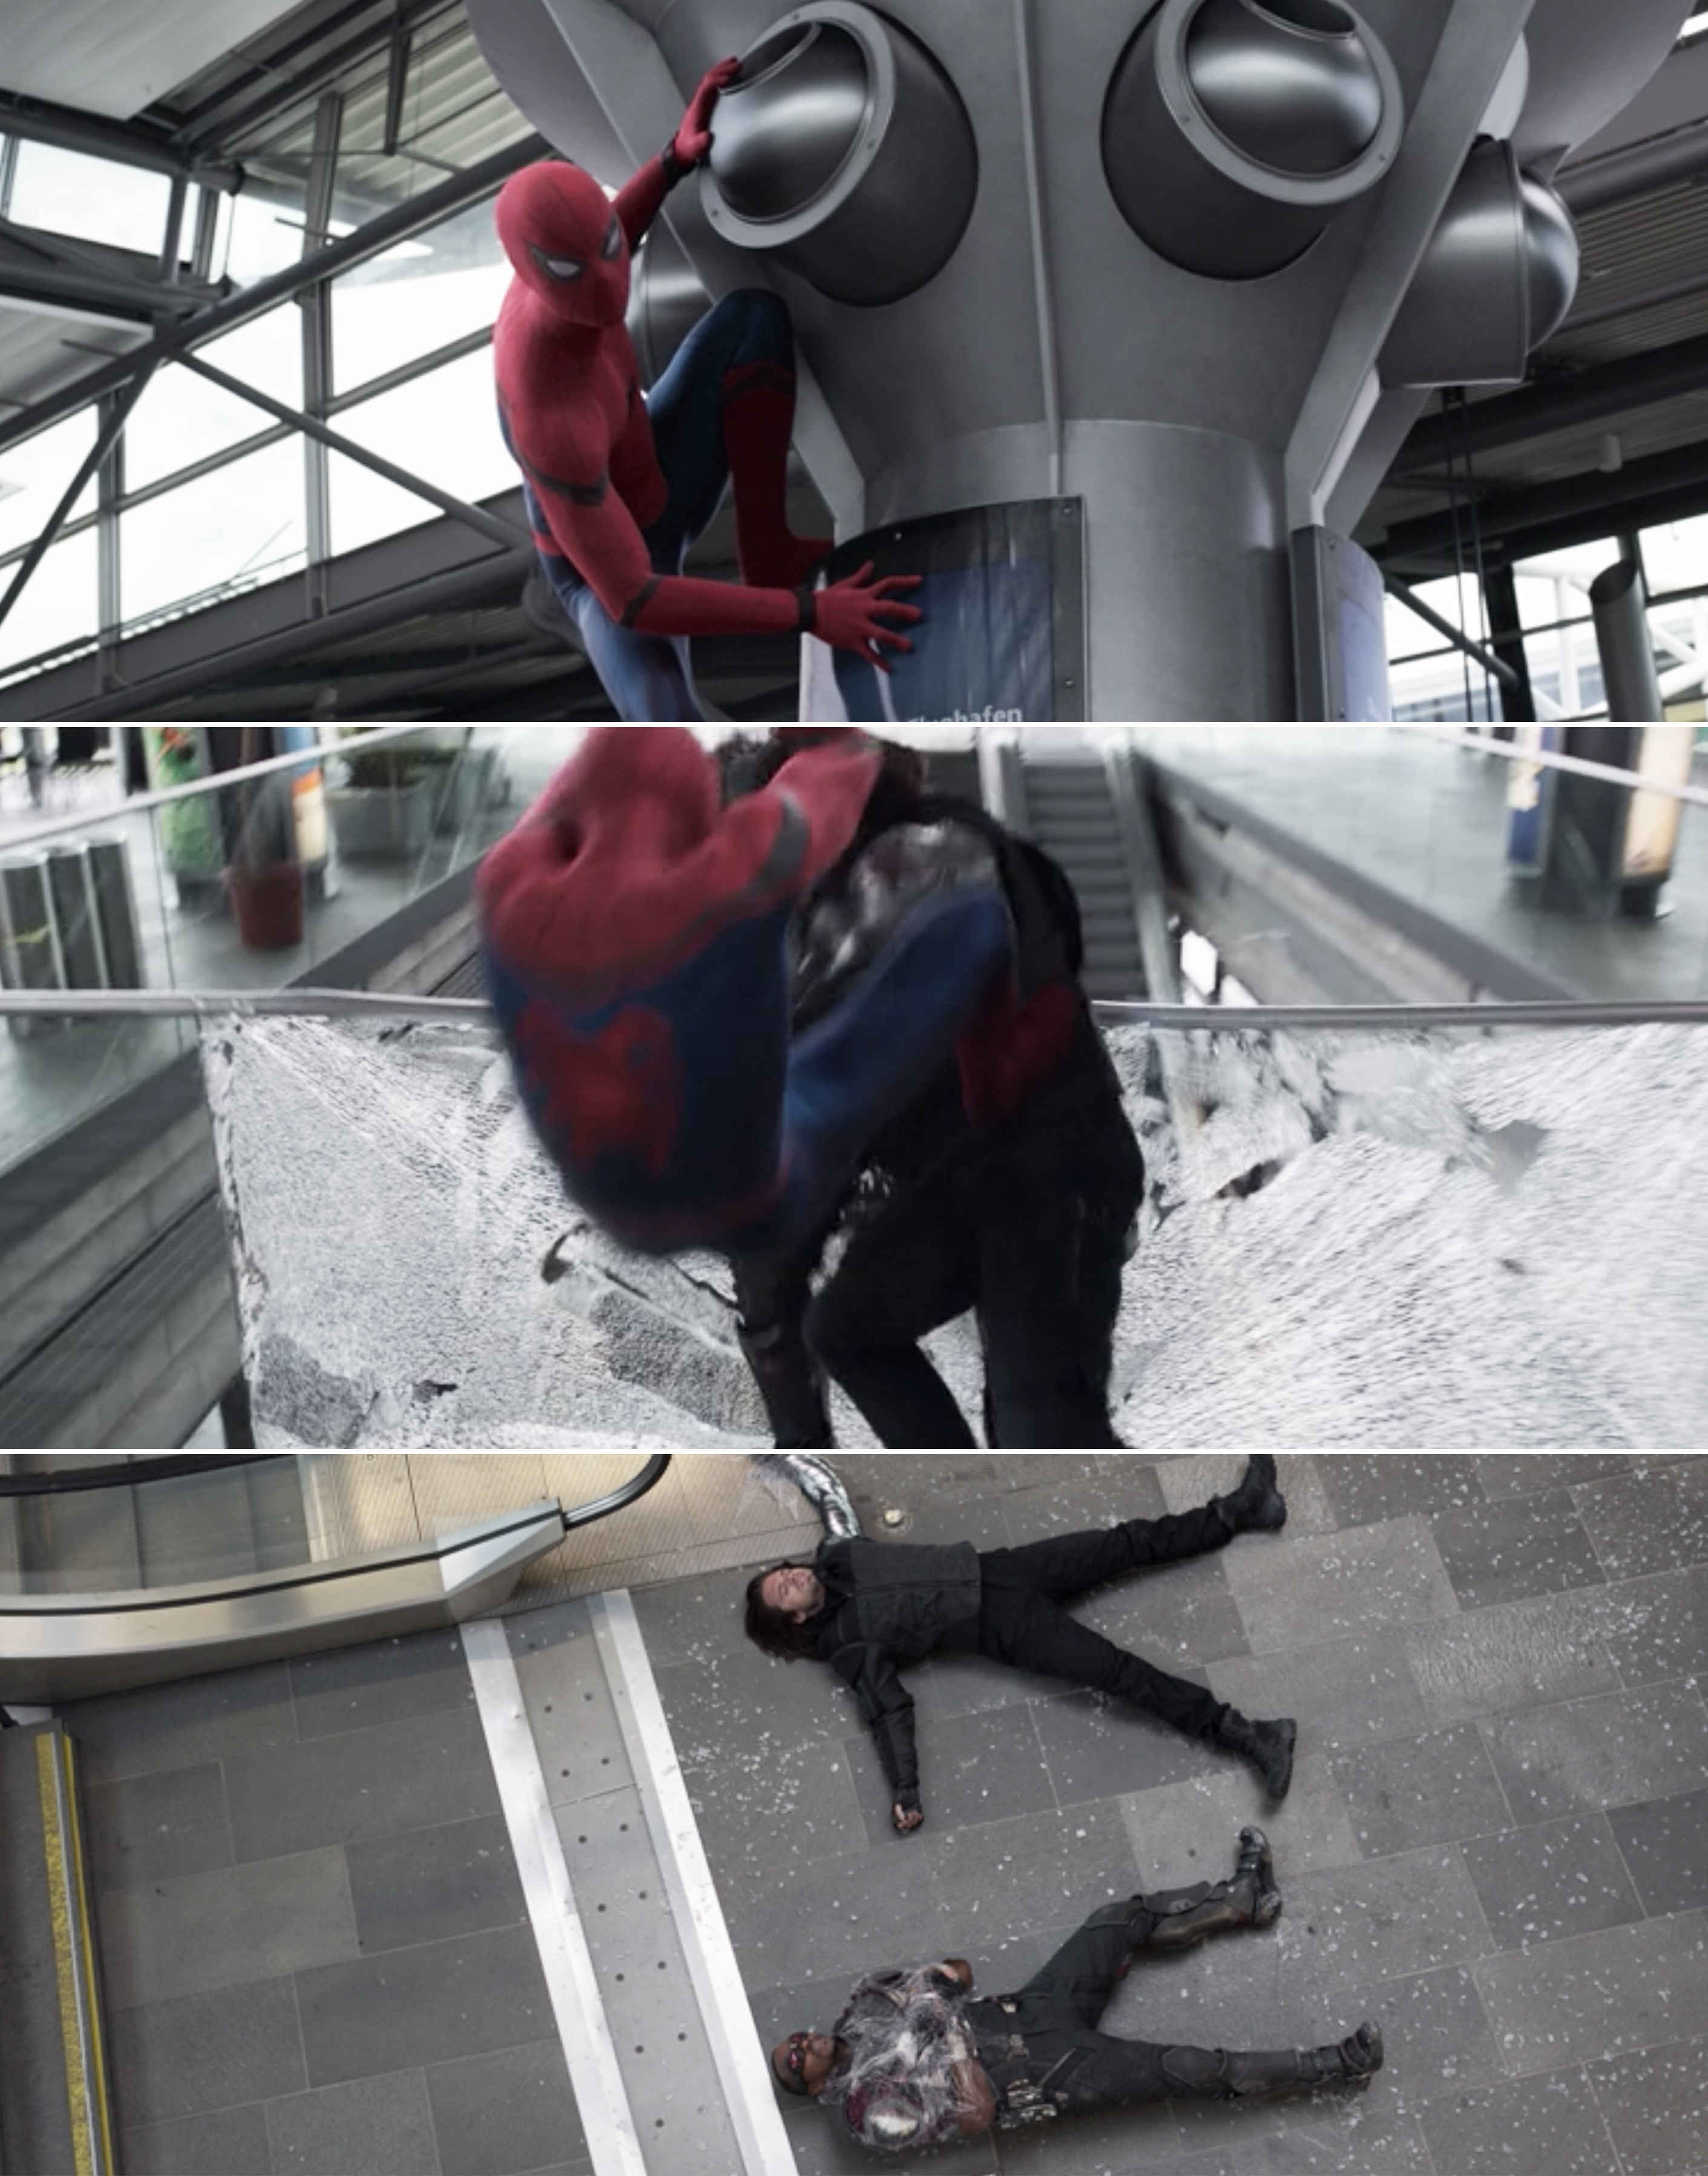 Bucky and Sam crashing to the ground after Spider-Man kicks them